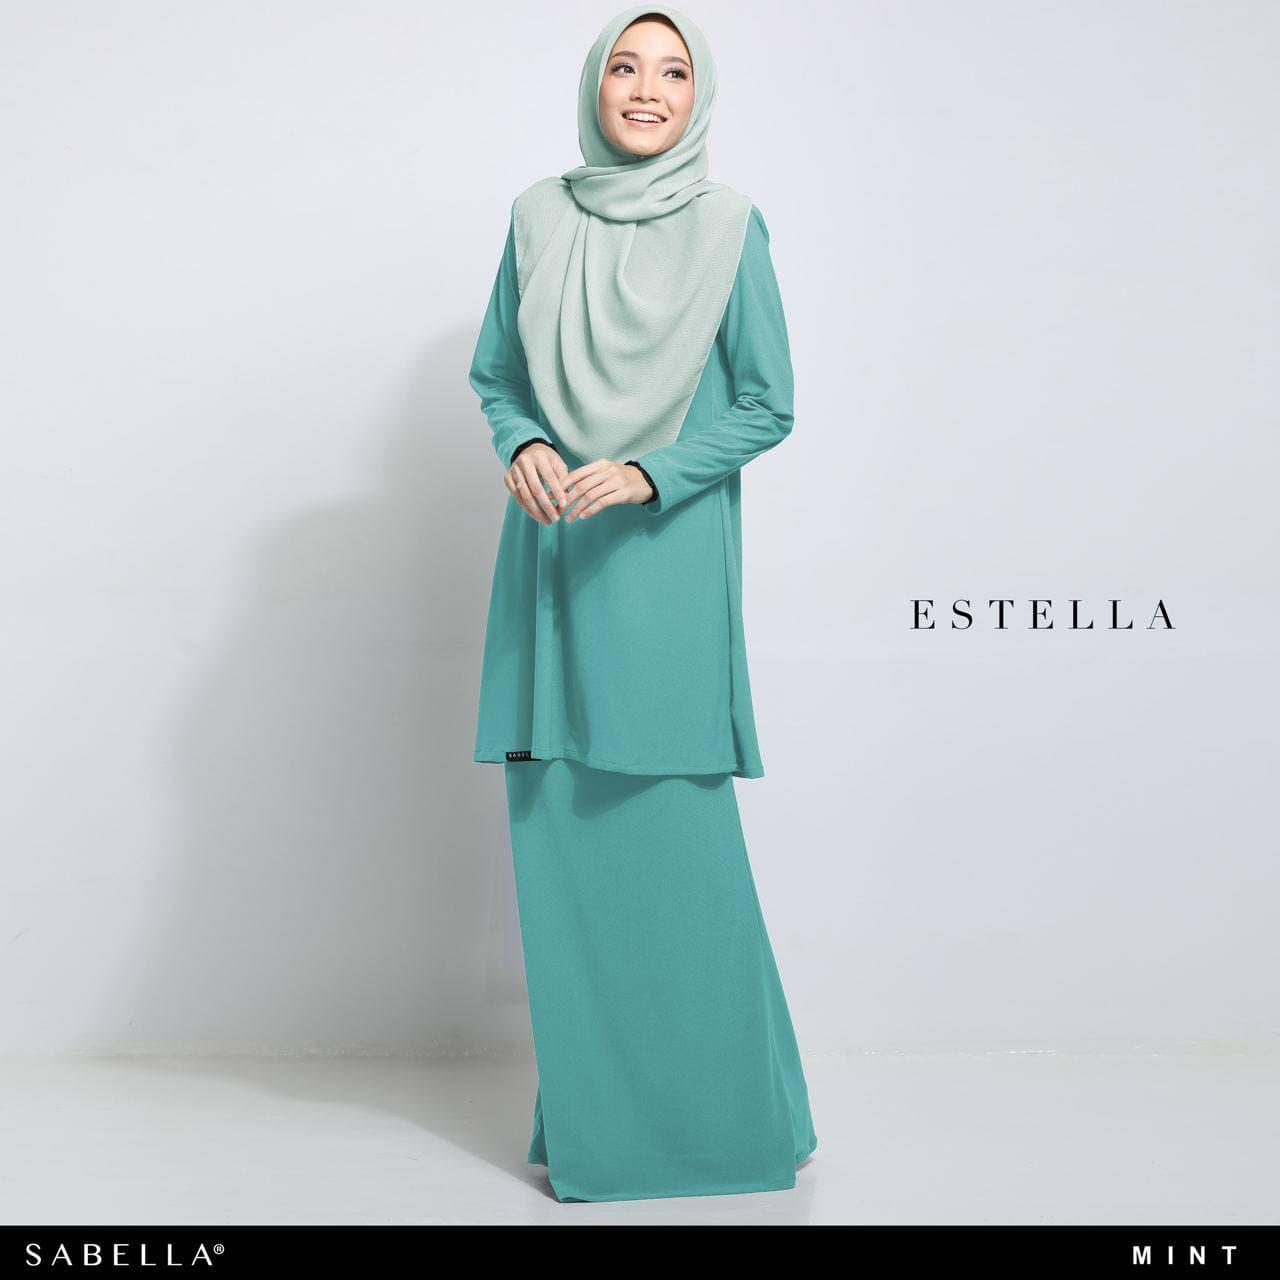 Estella 2.0 Mint (R)